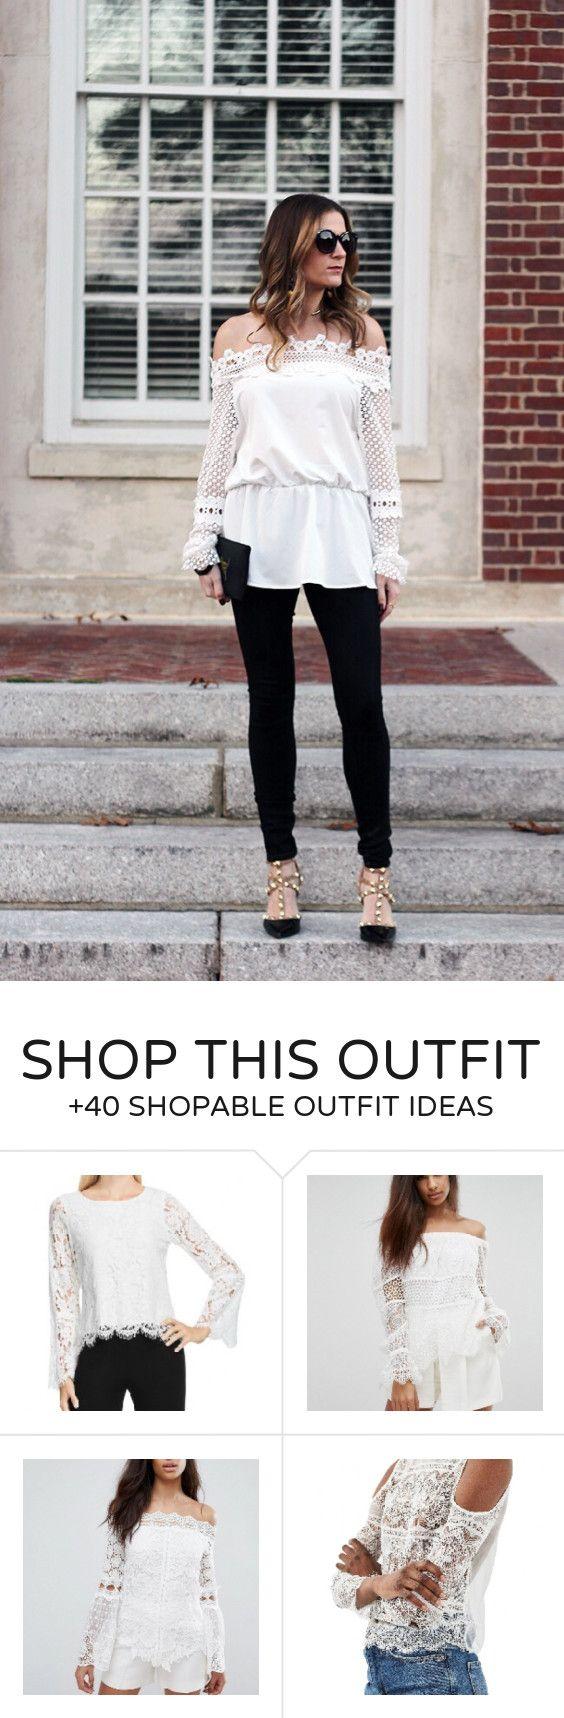 #winter #fashion /  White Lace Off Shoulder Top / Black Skinny Jeans / Studded Pumps